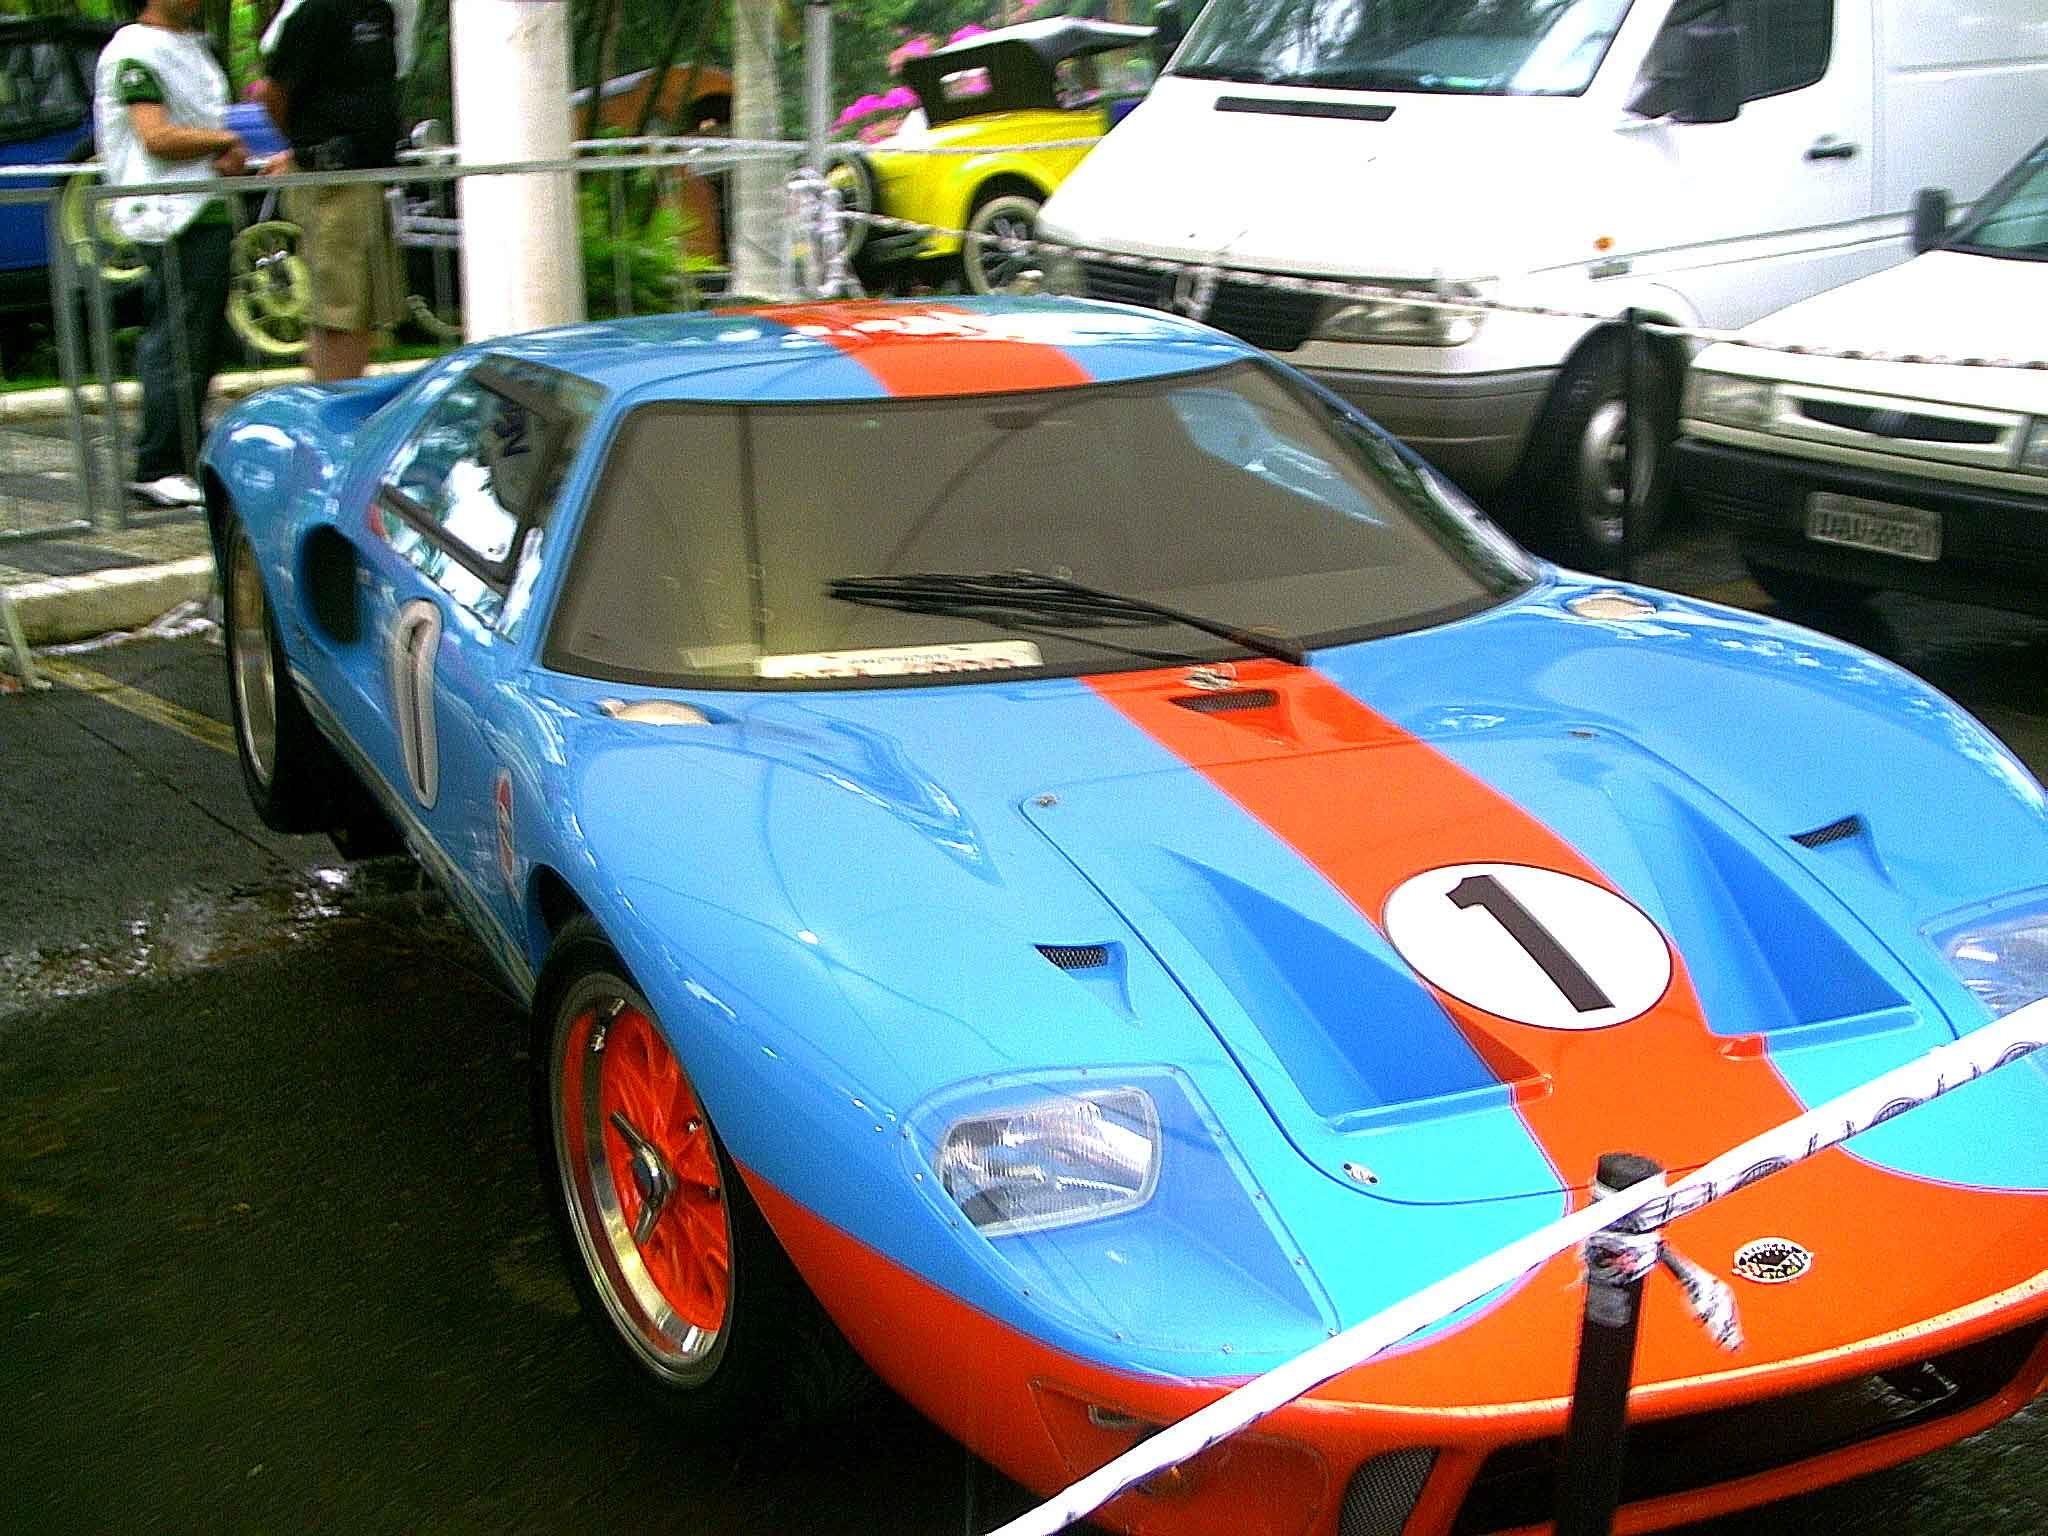 Americar Gta  Replica Do Ford Gt  Vencedor De Le Mans